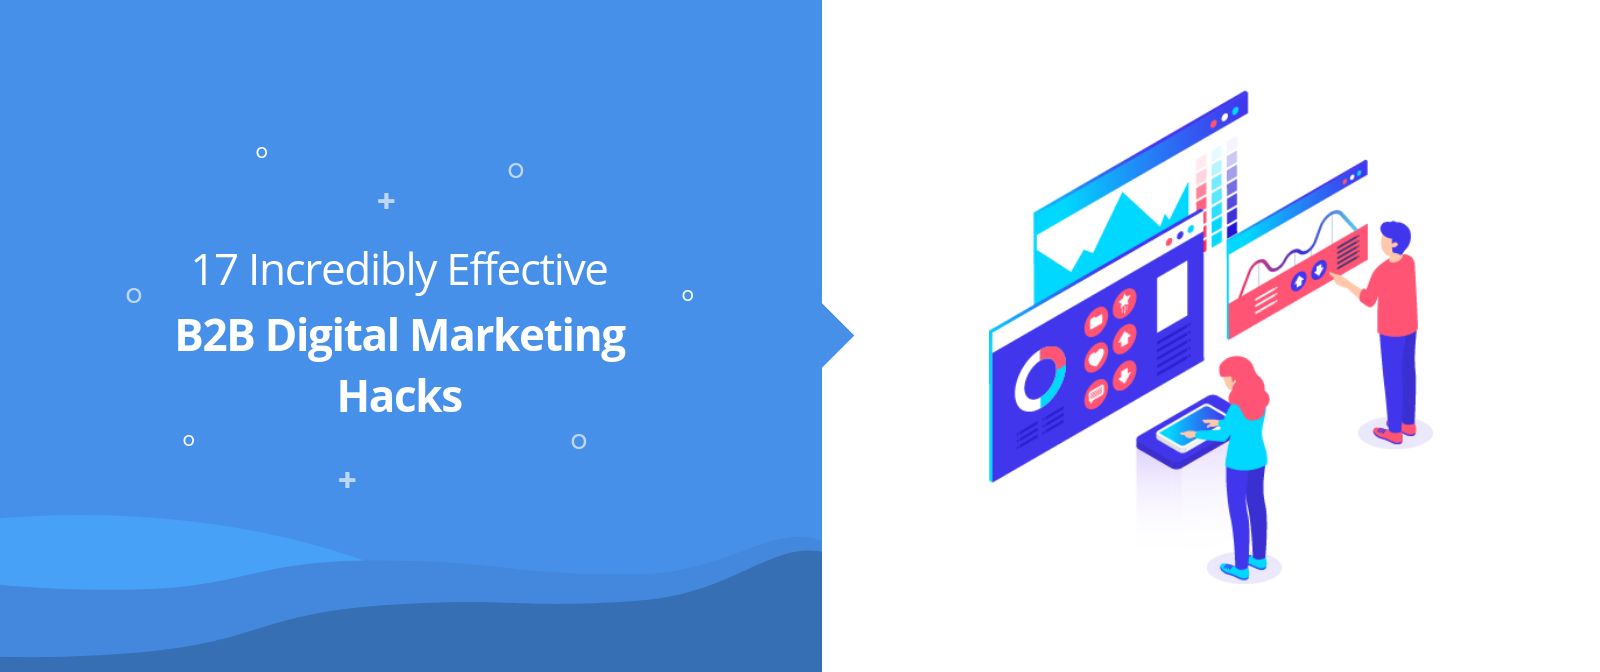 B2B Digital Marketing Hacks